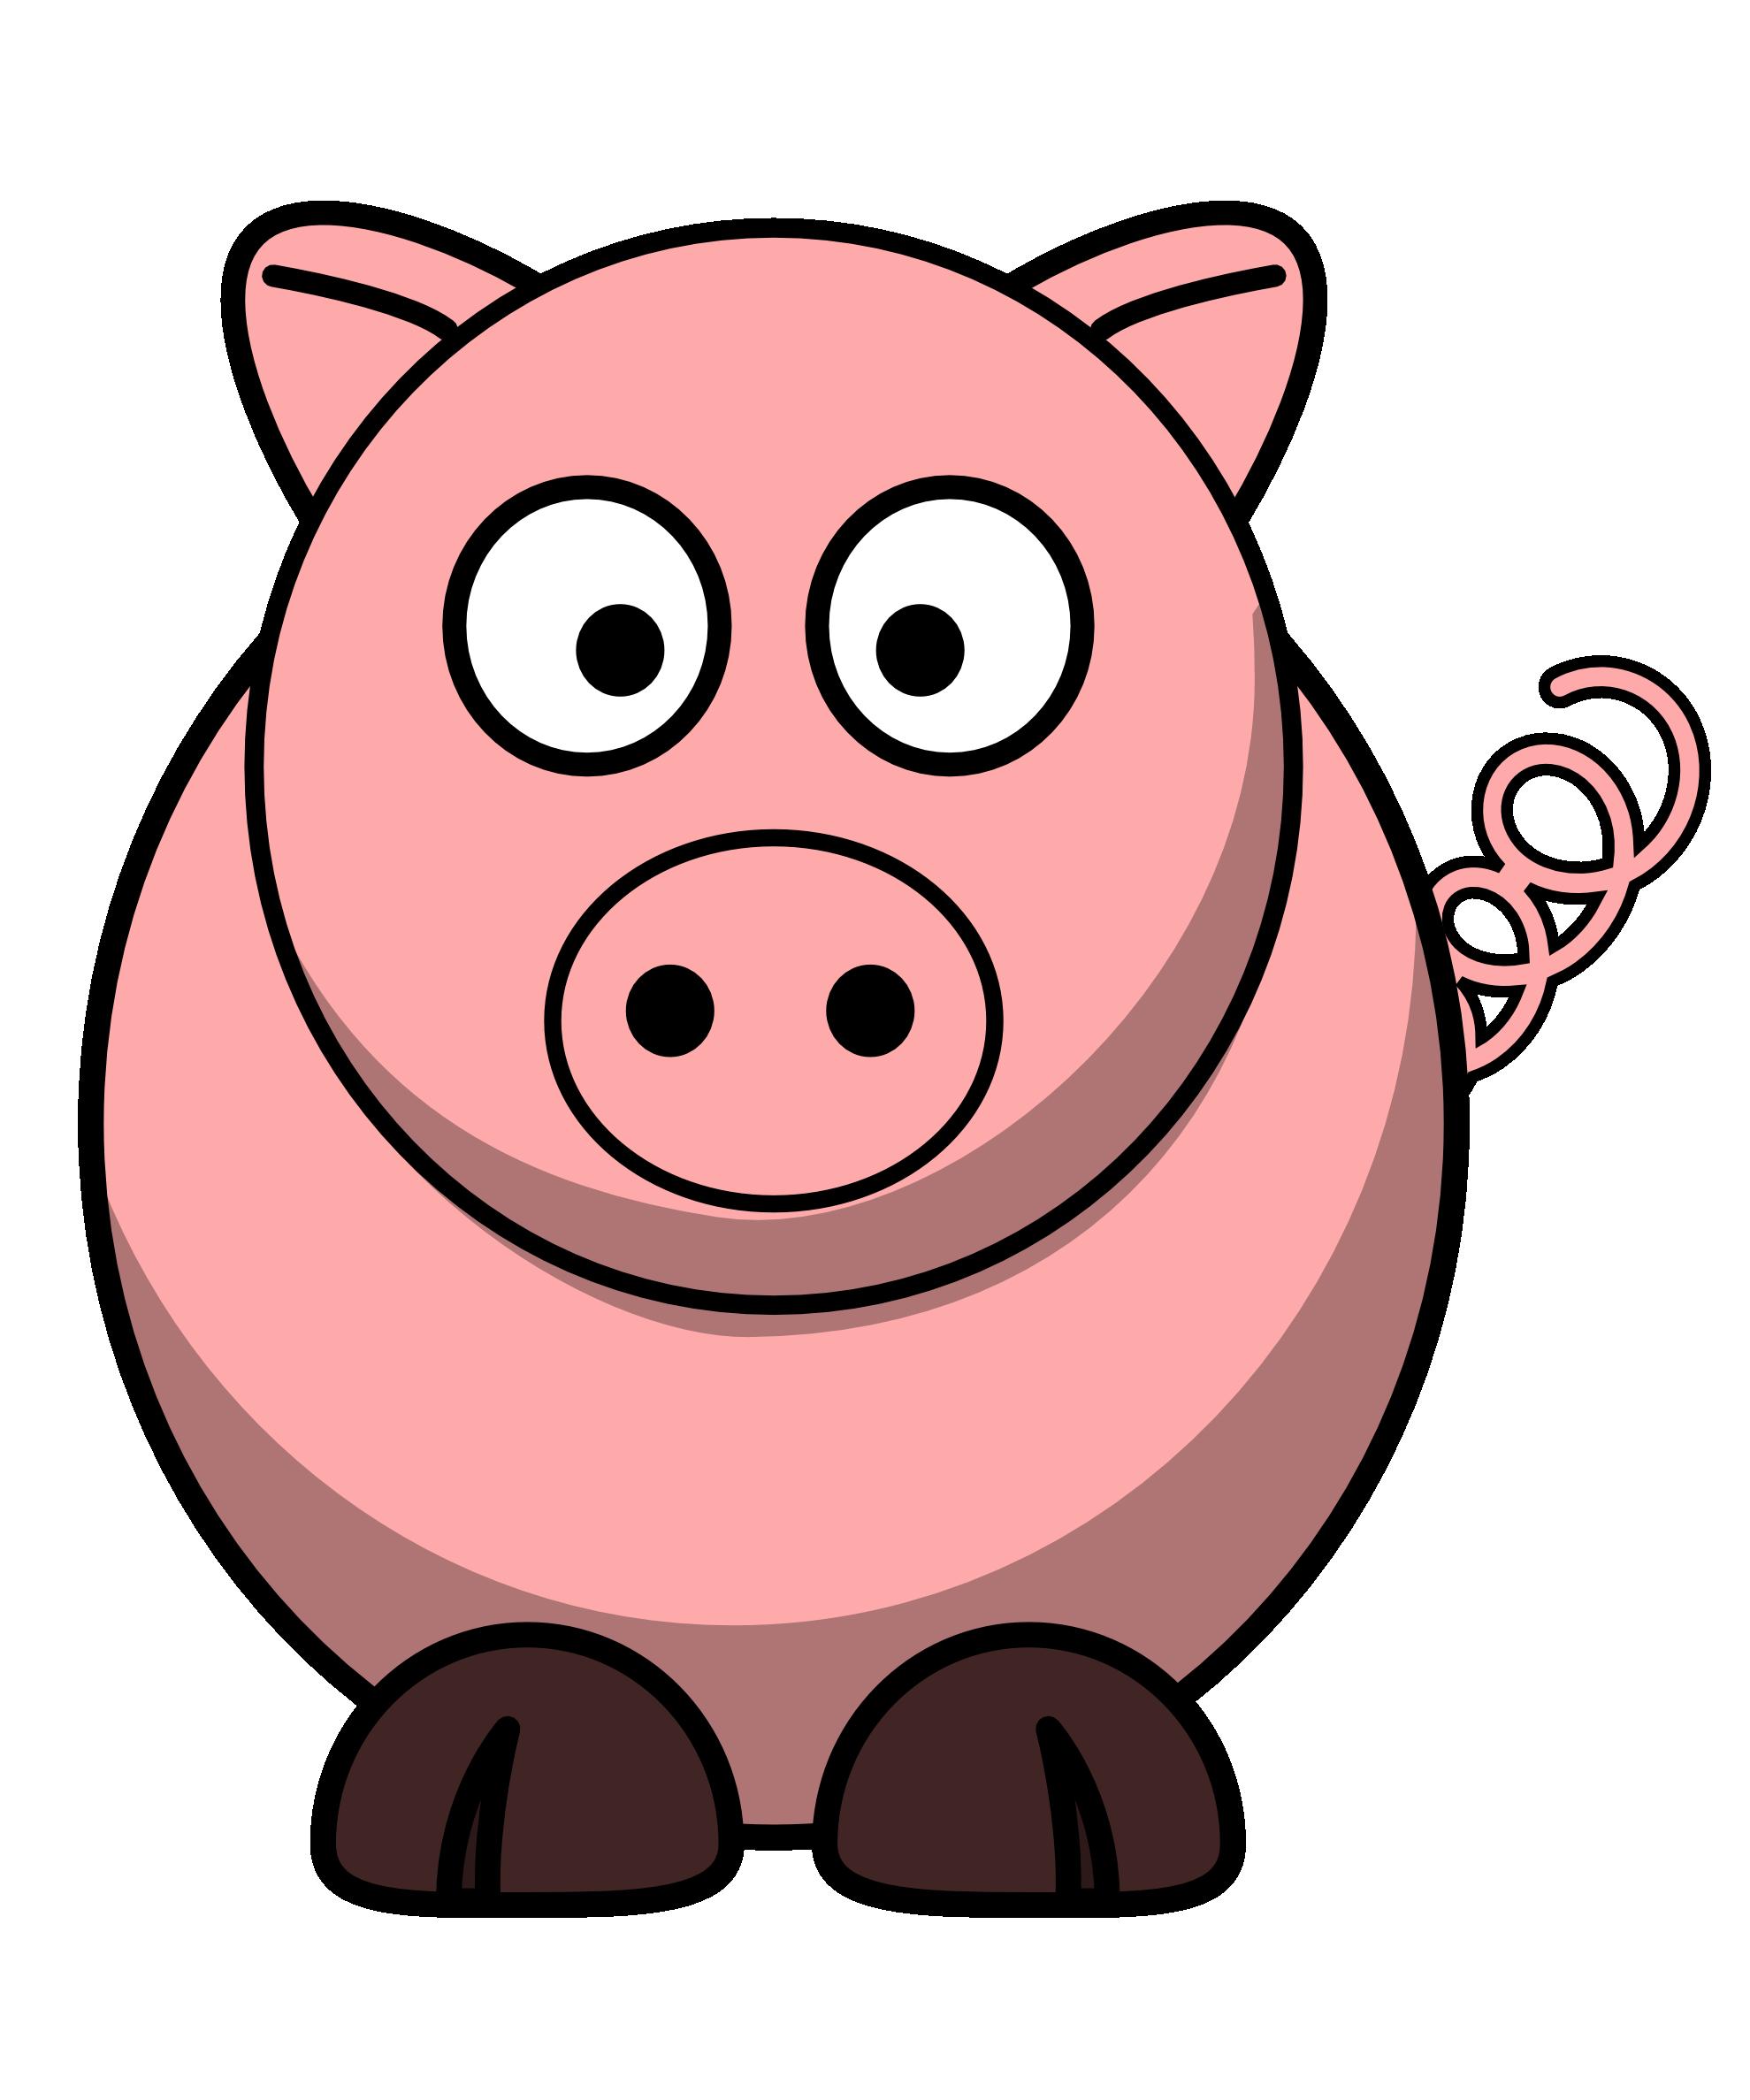 Pig svg #9, Download drawings